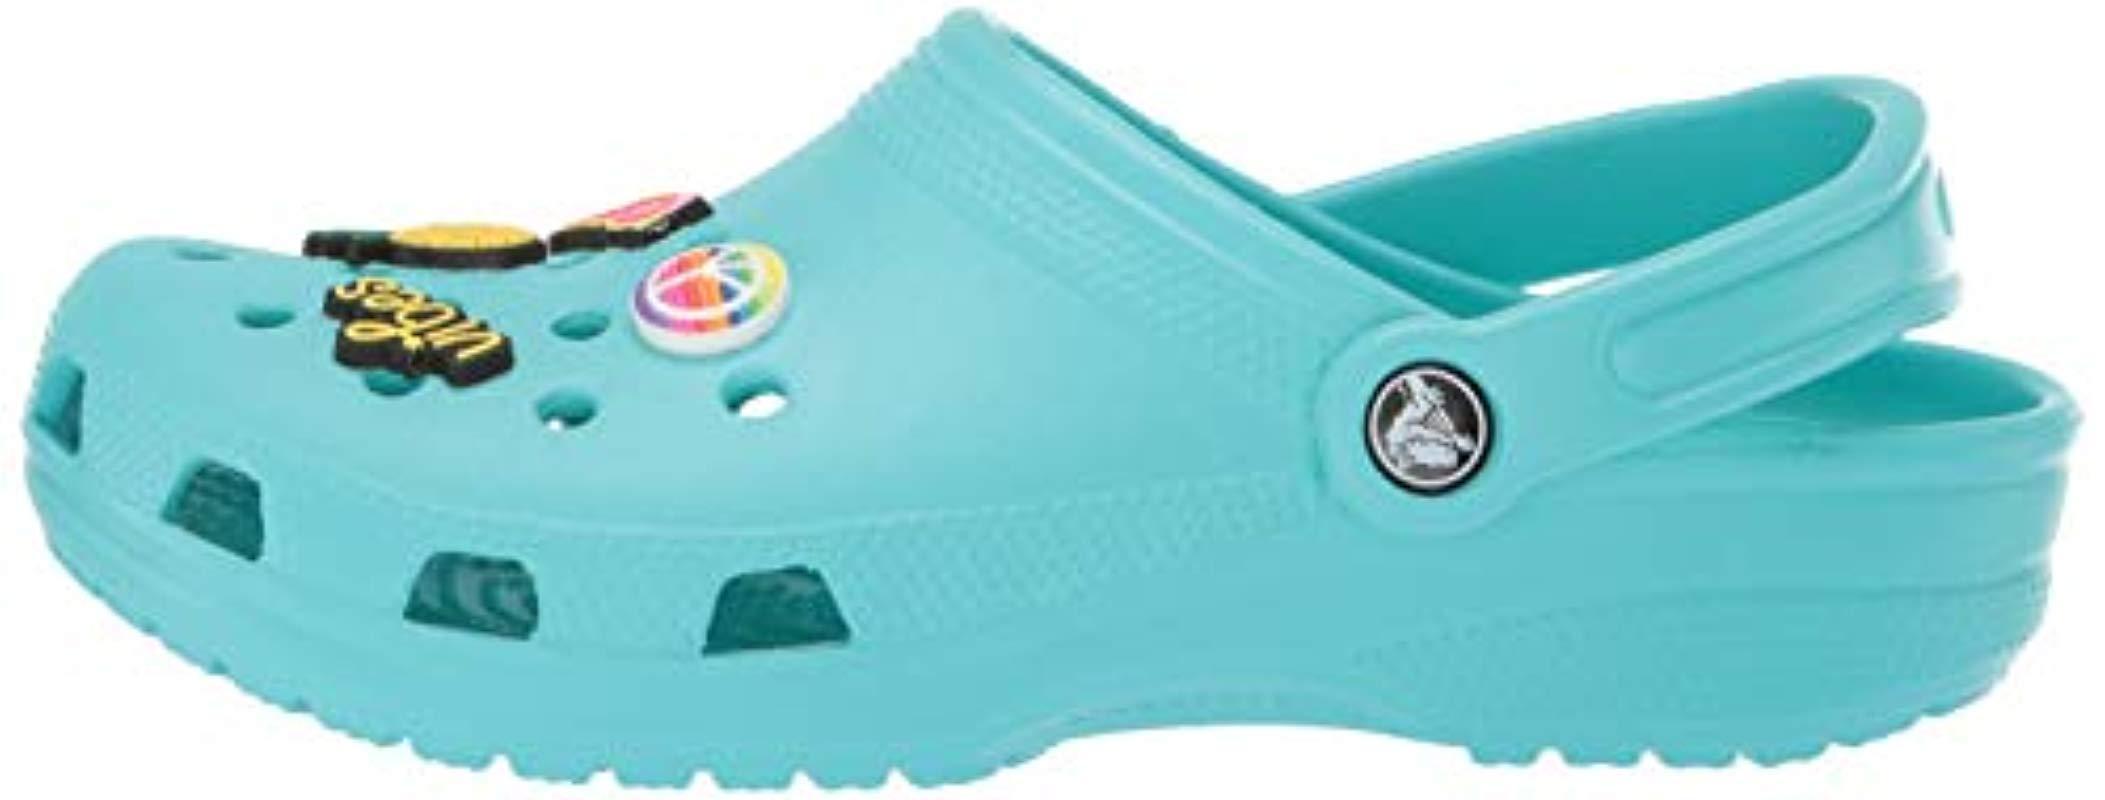 Jibbitz Crocs Chaussure pin's Charm Simpson skate 2